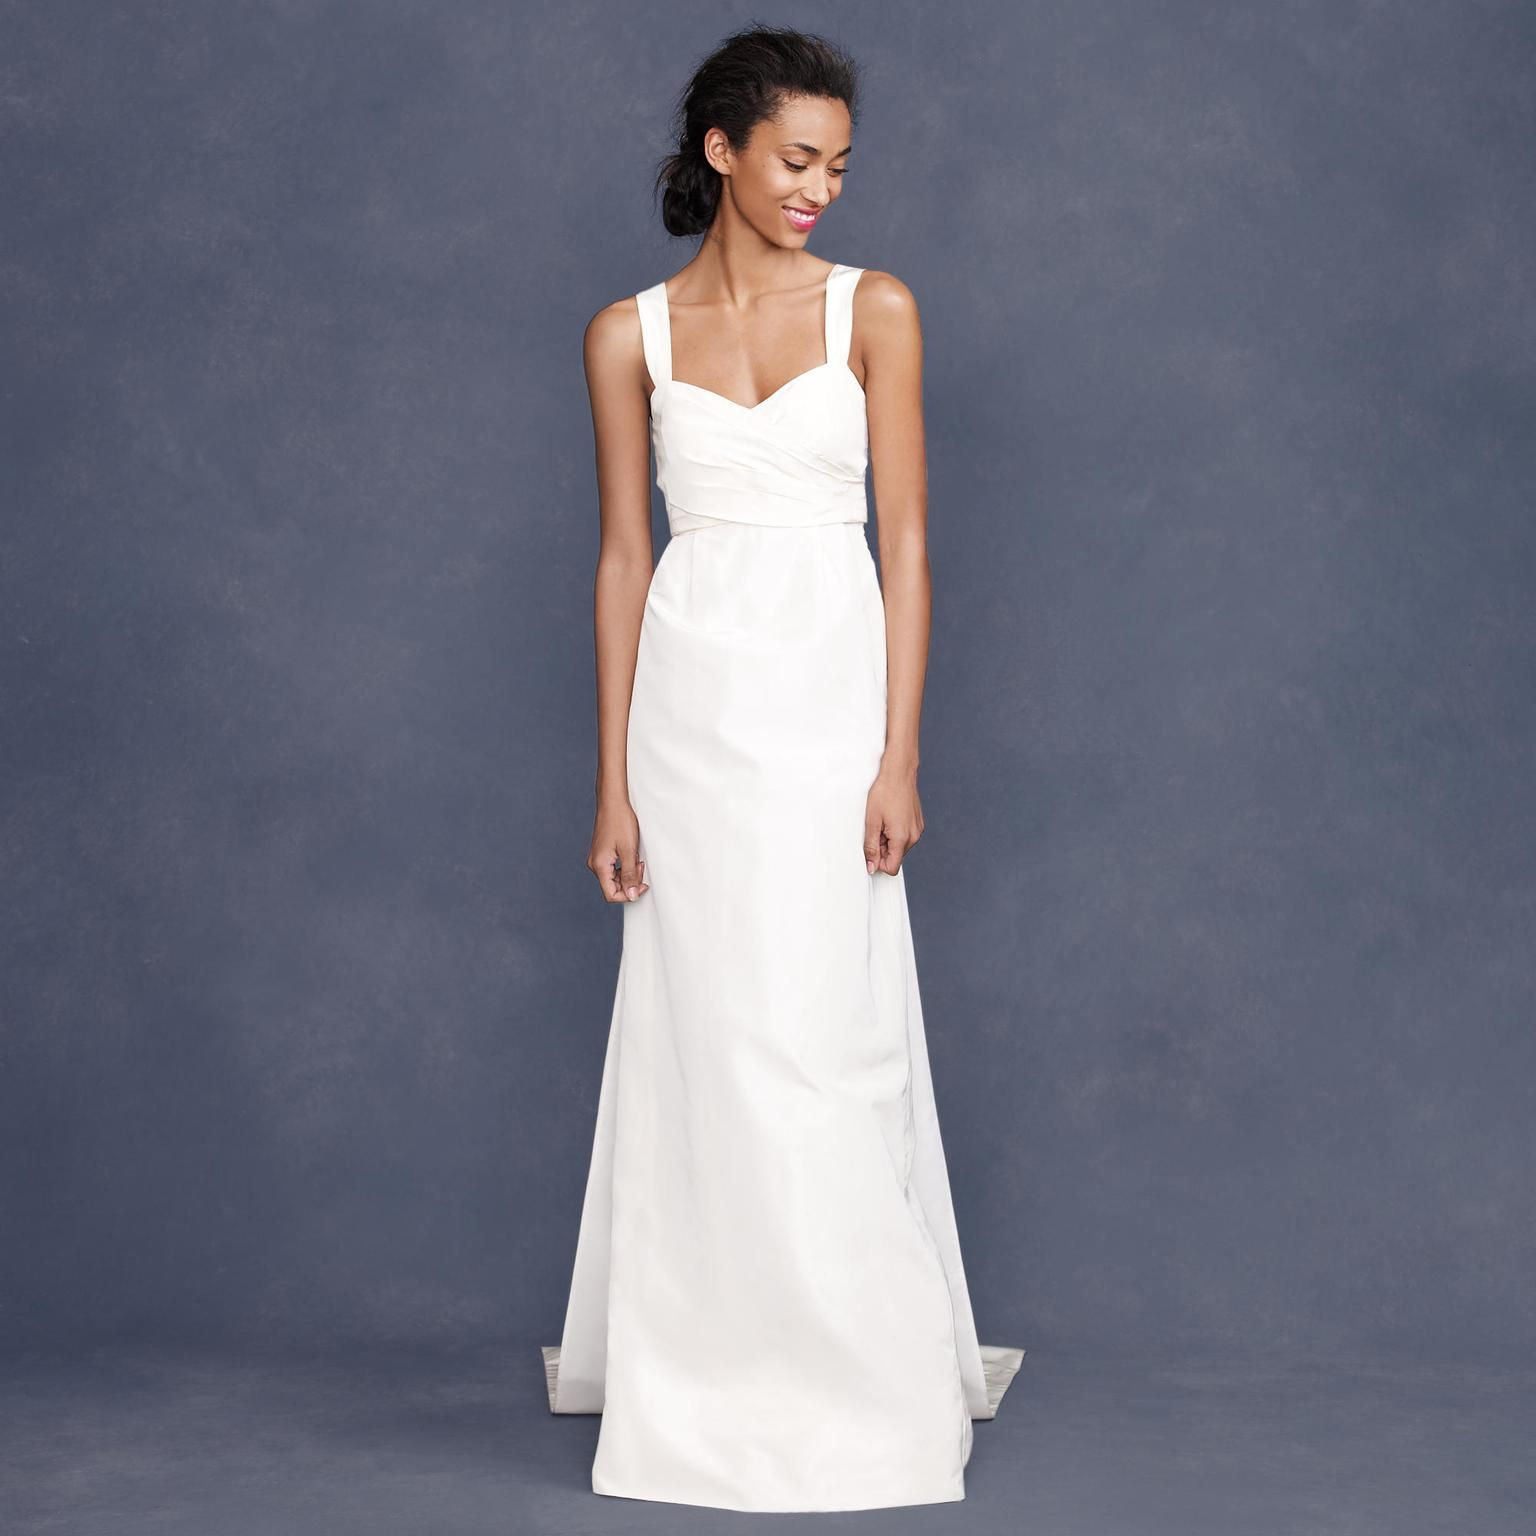 J Crew Larissa Wedding Dress New Size 8 225 Formal Dresses For Weddings Wedding Dress Sizes Gorgeous Wedding Dress